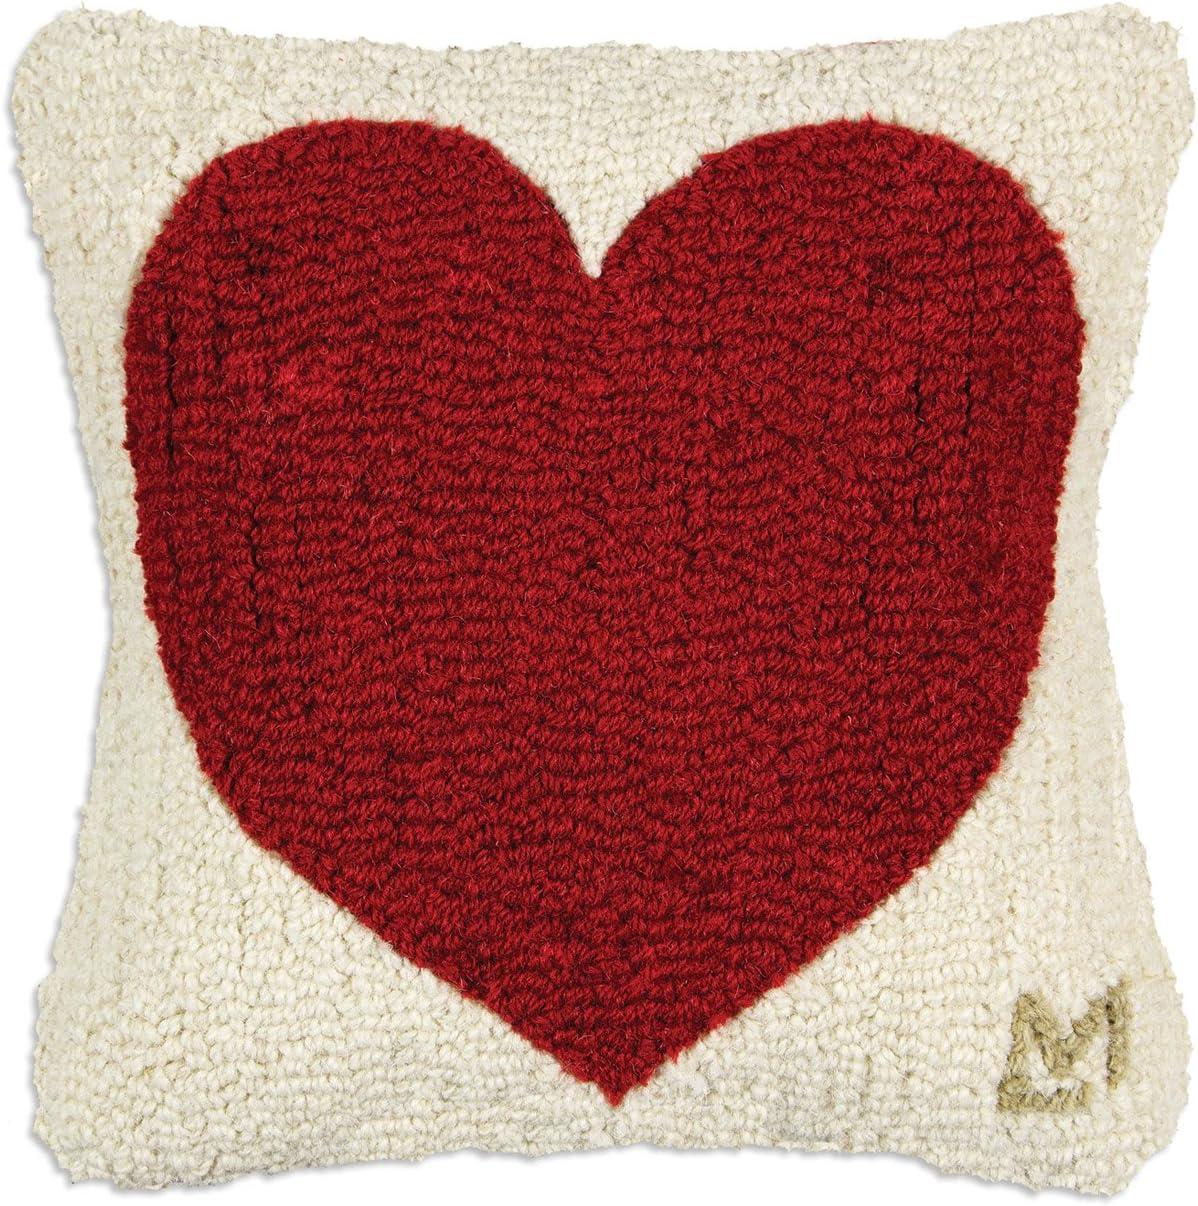 Chandler 4 Corners Artist-Designed Red Heart Hand-Hooked Wool Decorative Throw Pillow 14 x 14